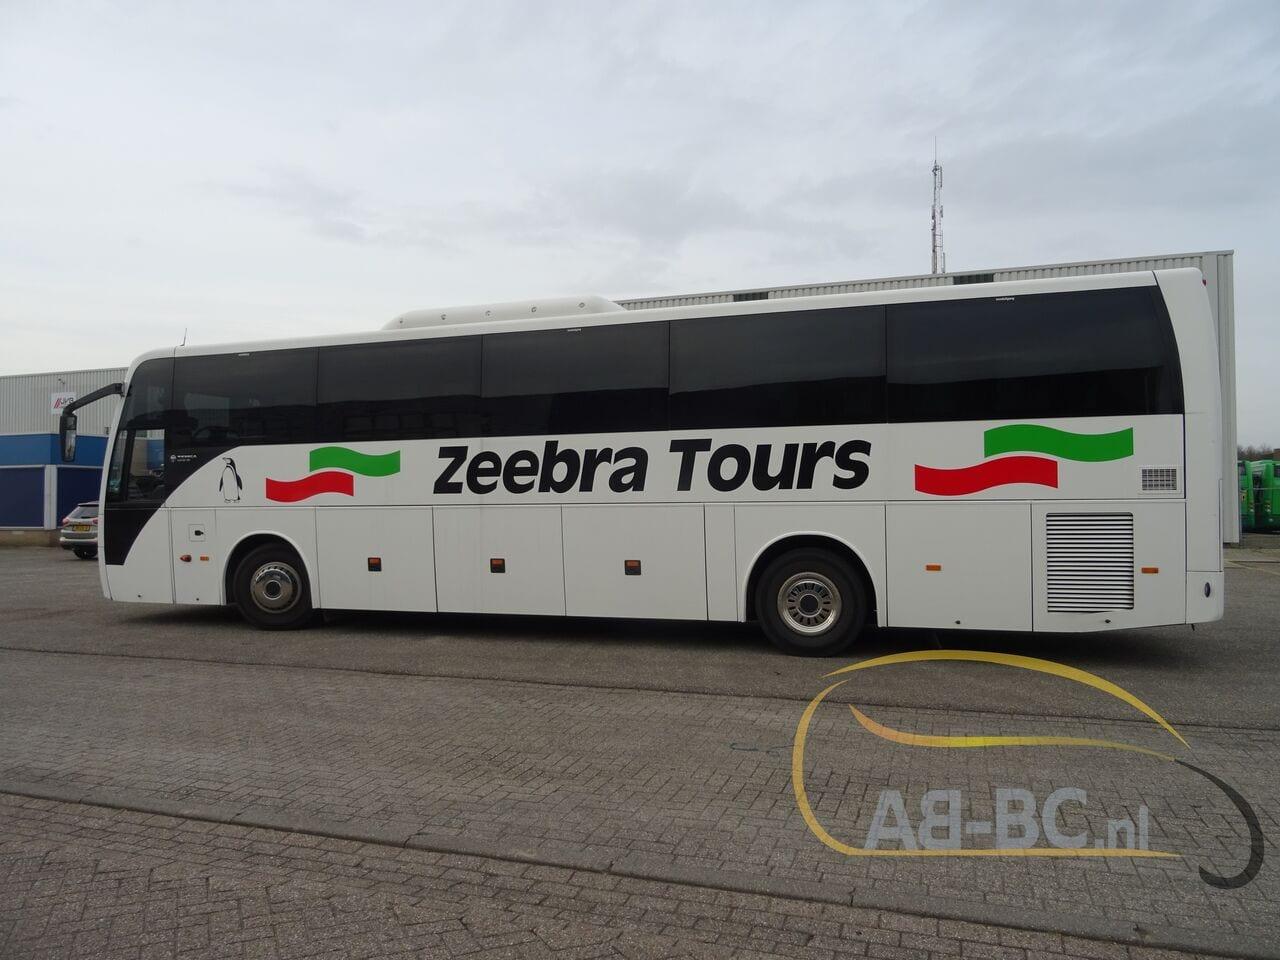 coach-busTEMSA-Safari-HD-51-Seats-EURO5-12-MTR---1614266370801349439_big_16451b9878191bf12eed0b9abbdb8b56--19052917224730818200